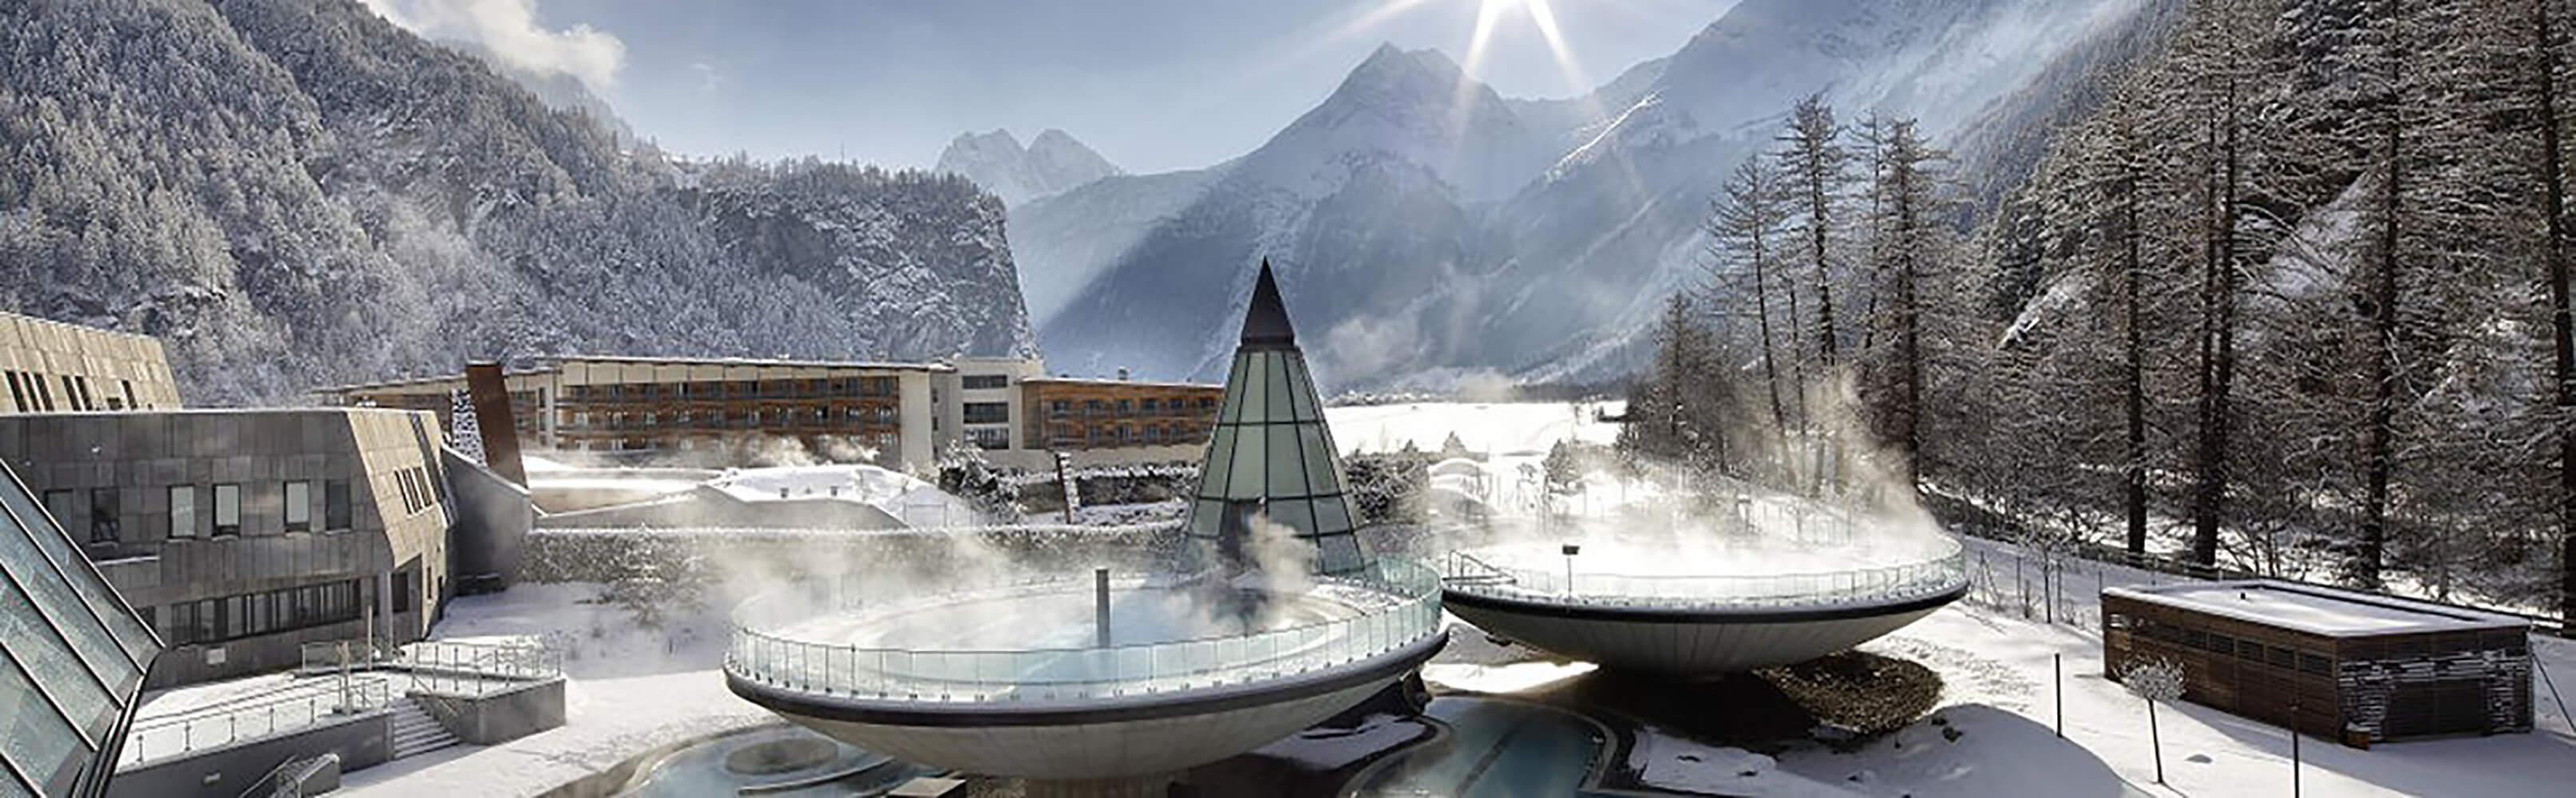 AQUA DOME - Tirol Therme Längenfeld: Alpenwellness vor imposanter Bergkulisse  1